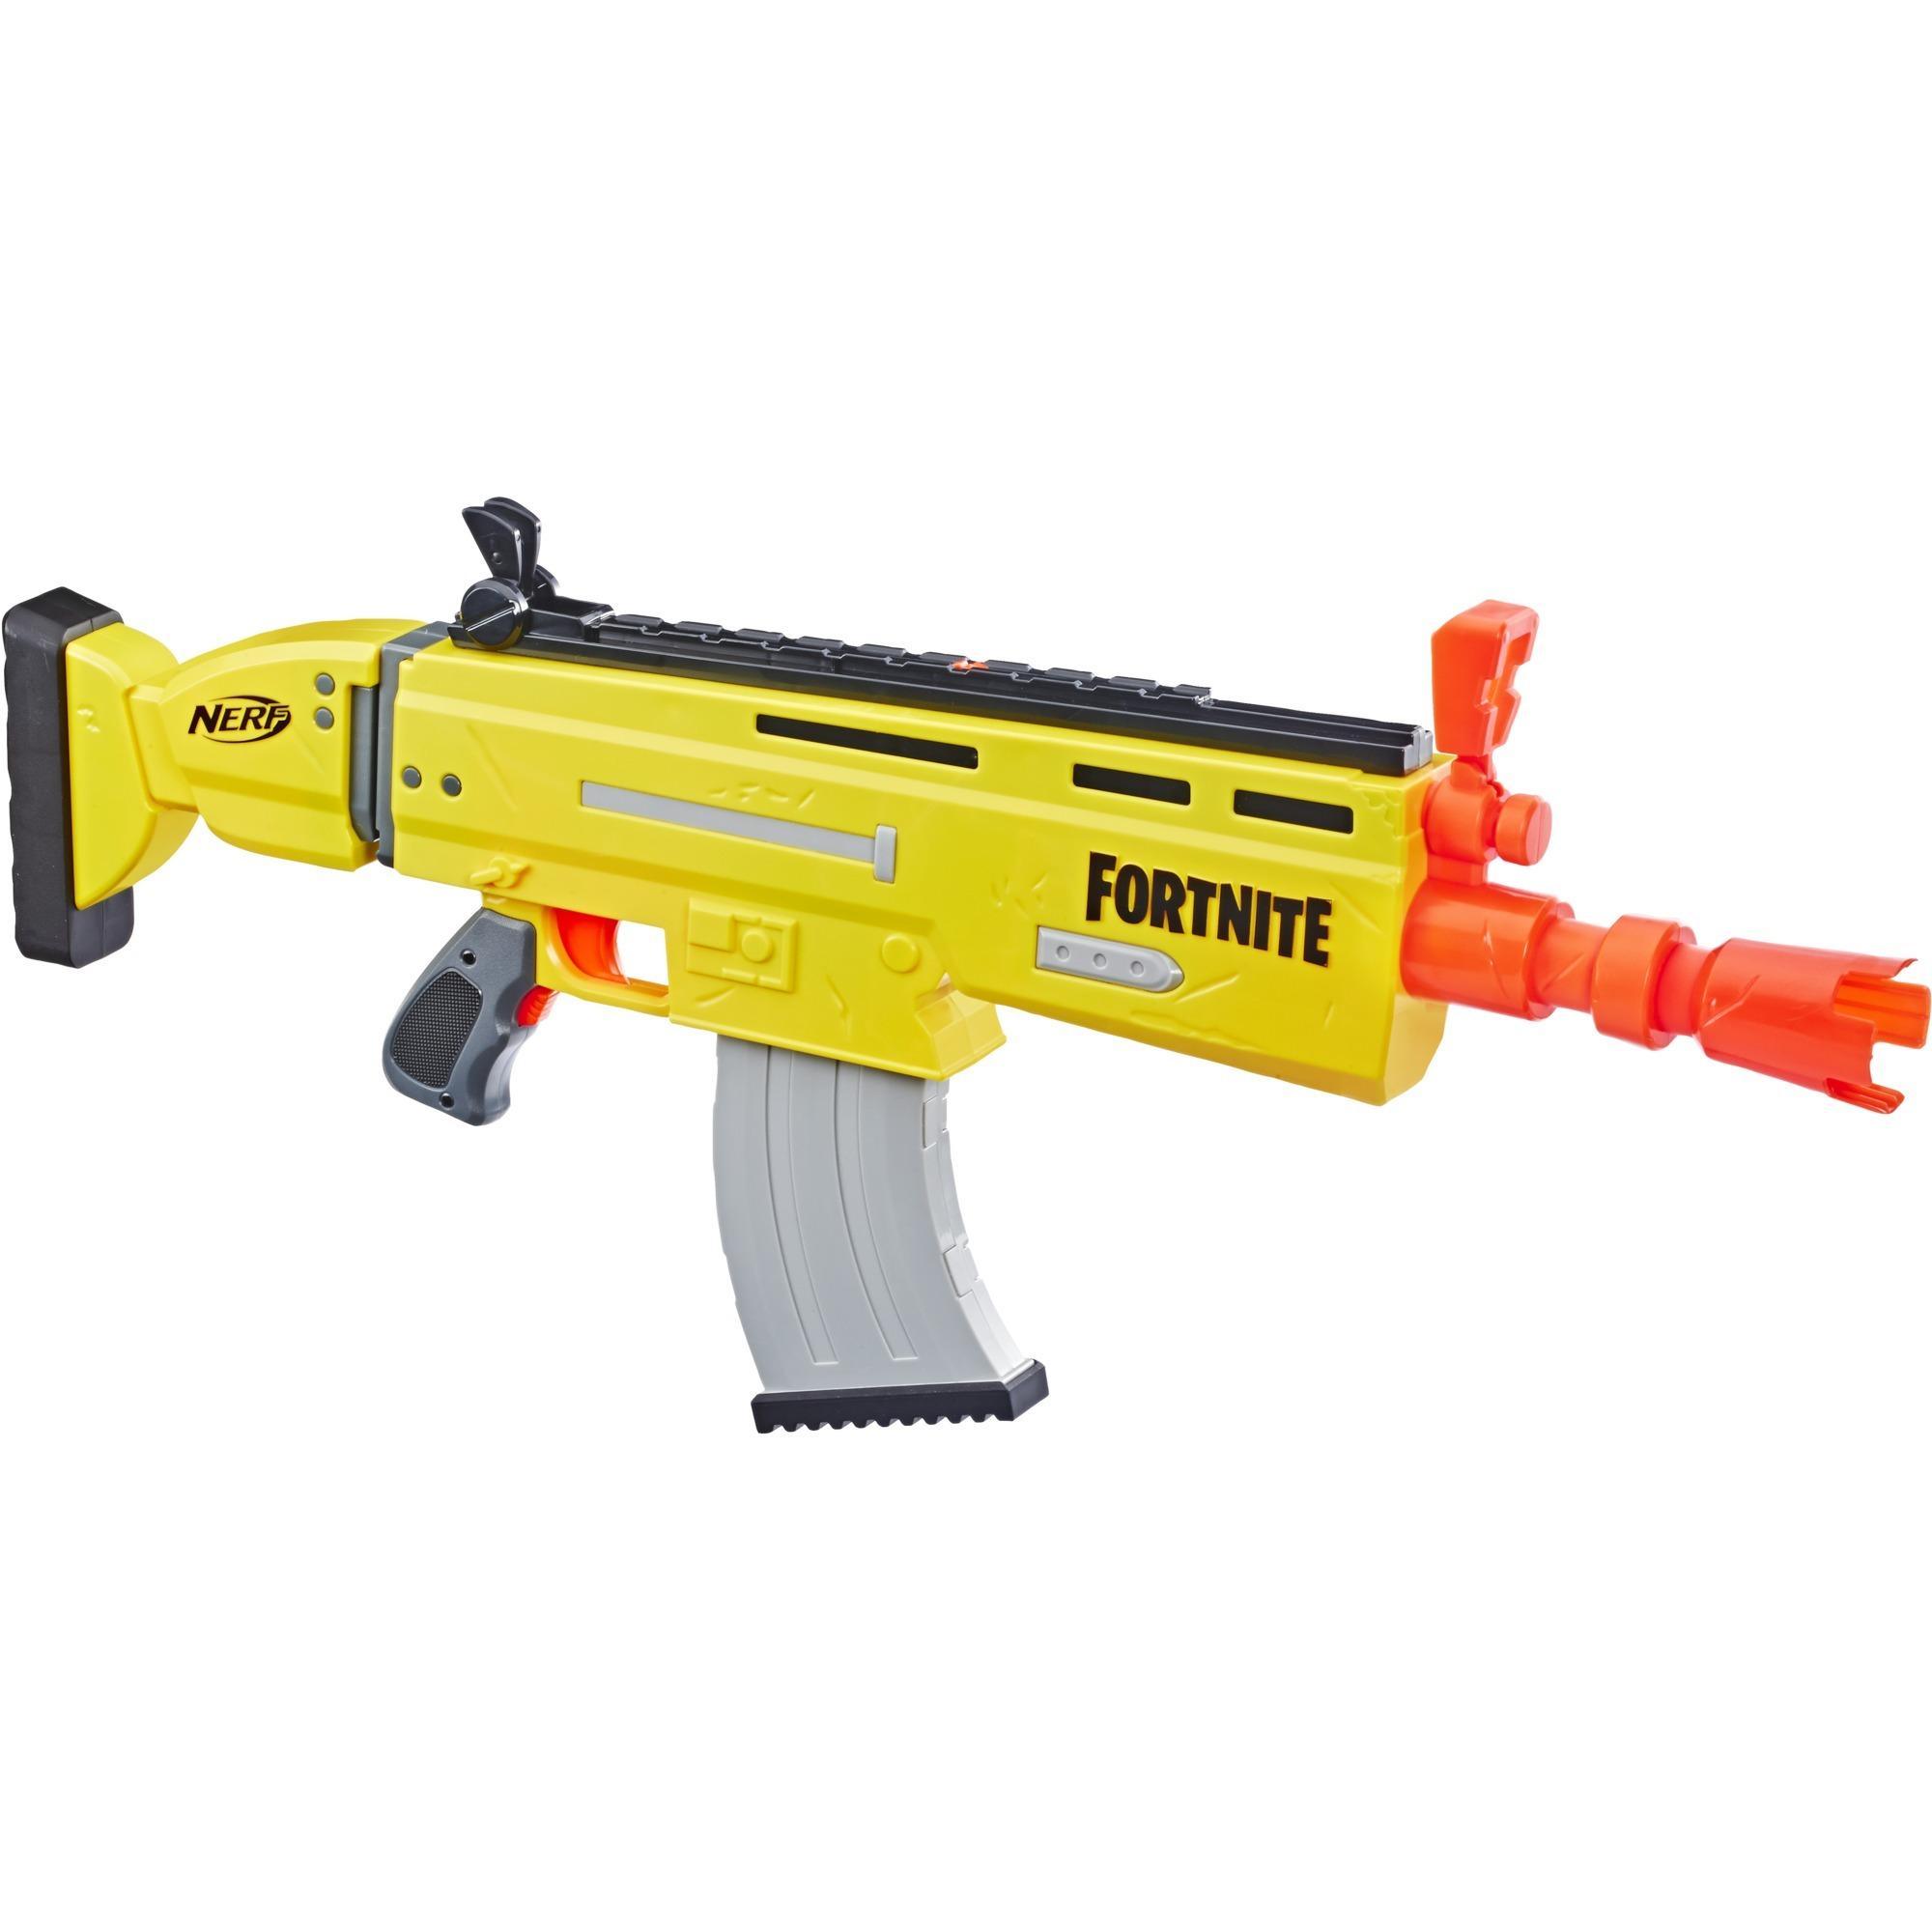 Fortnite AR L Nerf Elite Dart Blaster, Pistola NERF (giallogrigio, Blaster giocattolo, 8 annoi, RagazzoRagazza, Multicolore, Fortnite, 1,5 V)